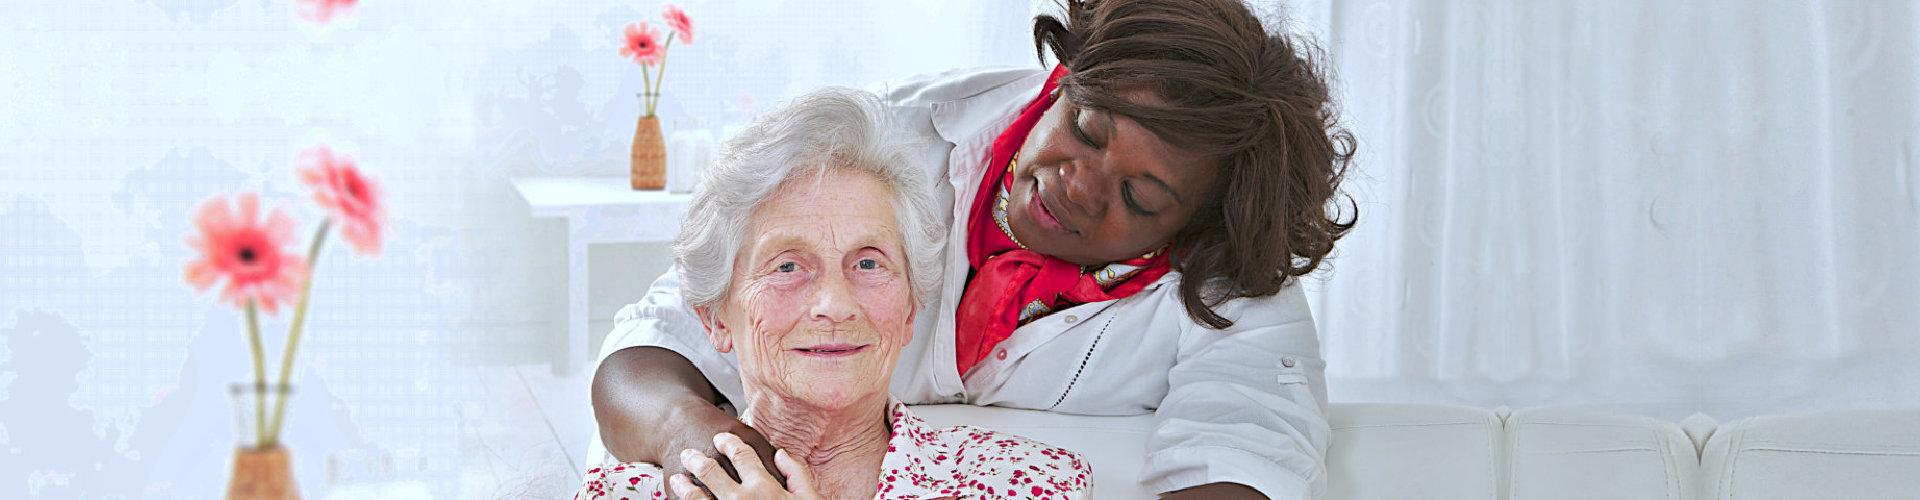 happy senior woman with friendly lady caregiver